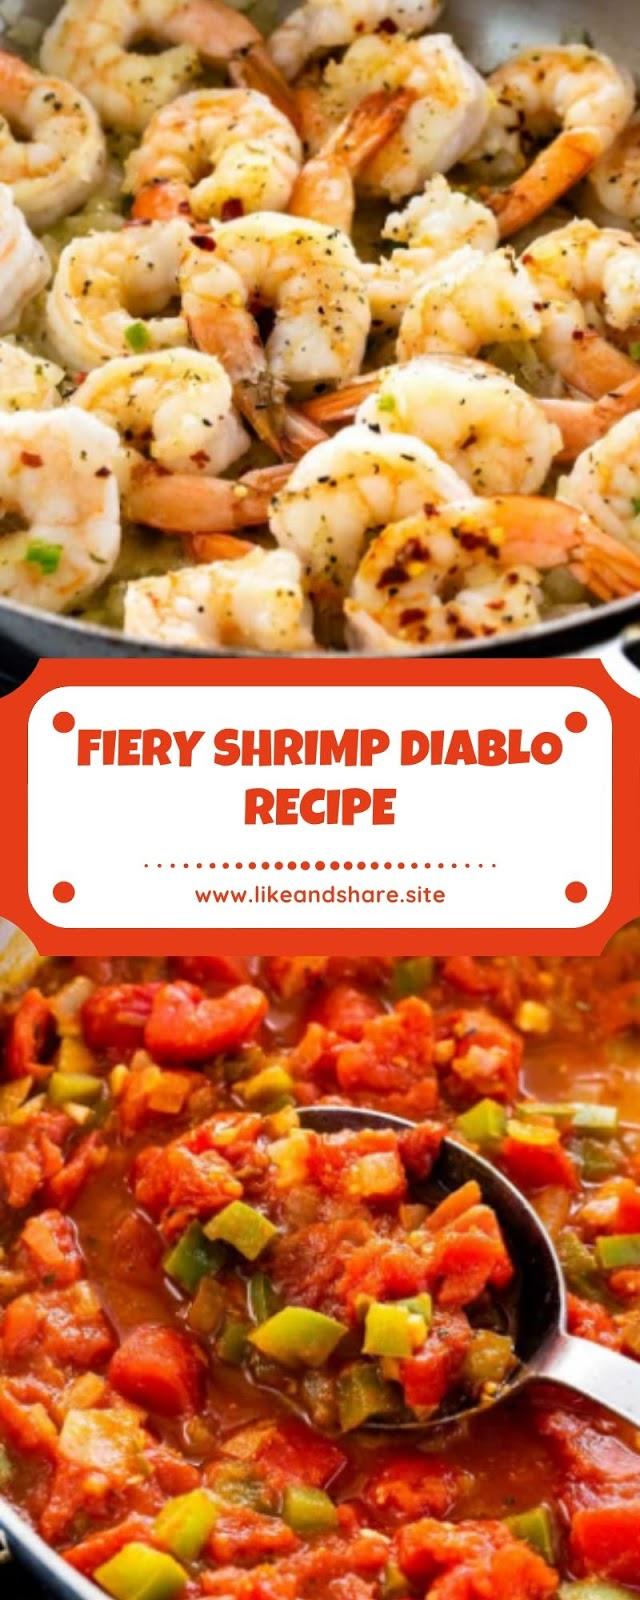 FIERY SHRIMP DIABLO RECIPE